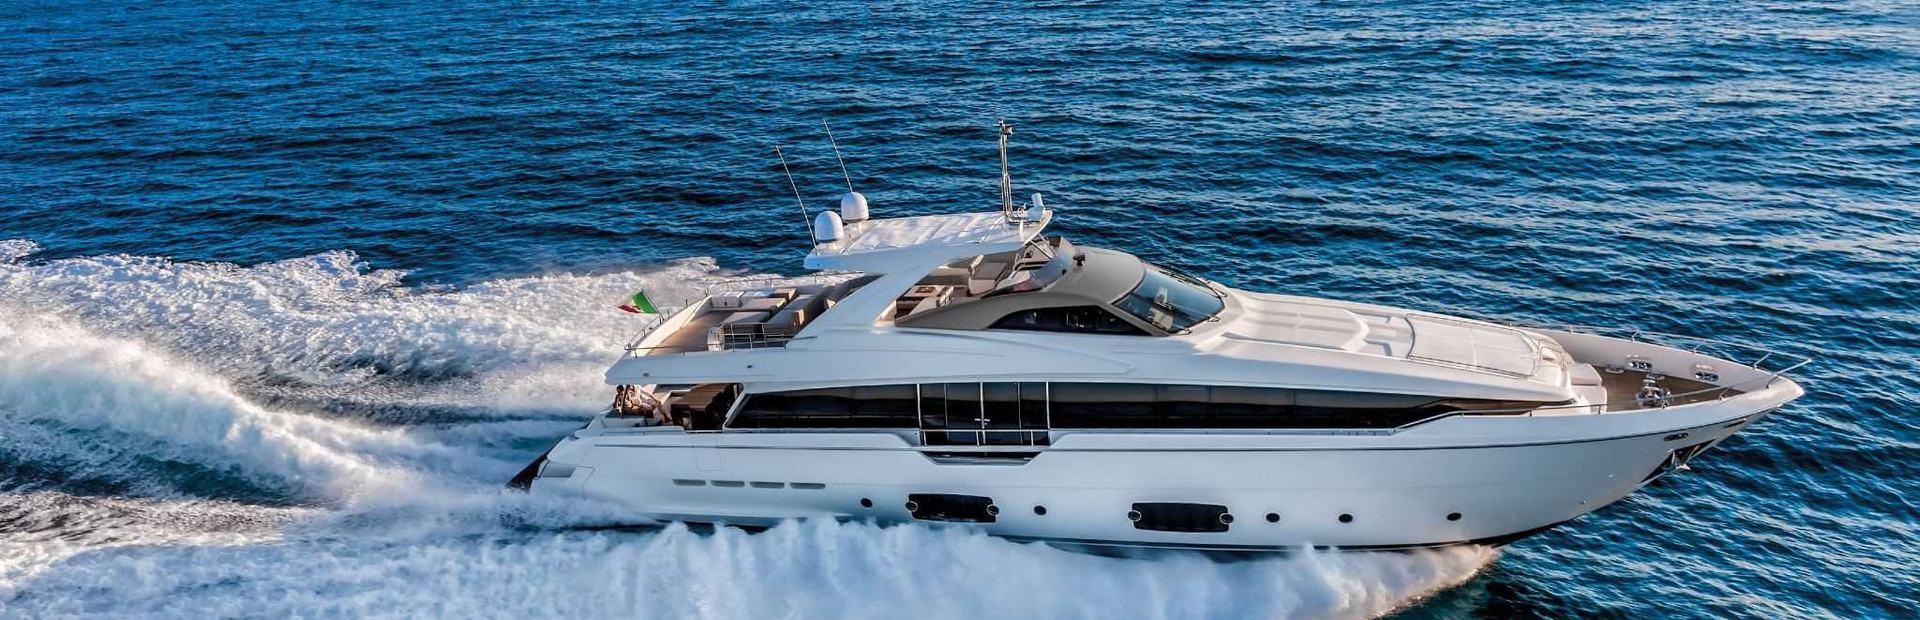 Ferretti 960 Yacht Charter